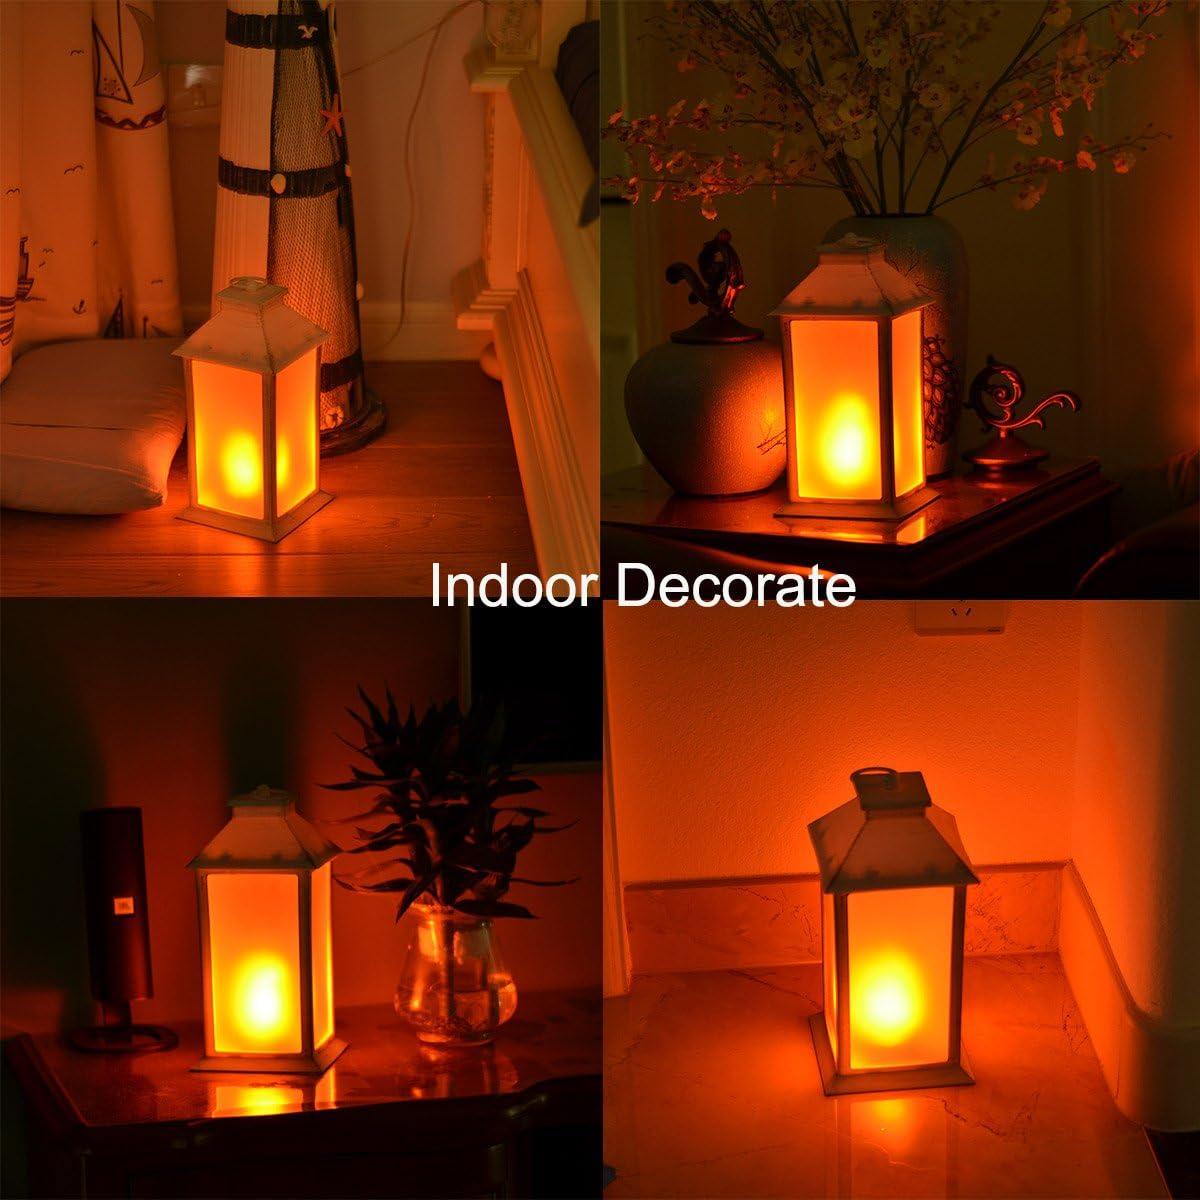 Indoor//Outdoor Hanging Lantern,Decorative Candle Lantern zkee 13 Vintage Style Decorative Lantern,Flickering Flame Effect LED Lantern, Golden Brushed White,4 Hours Timer Battery Included Set of 2